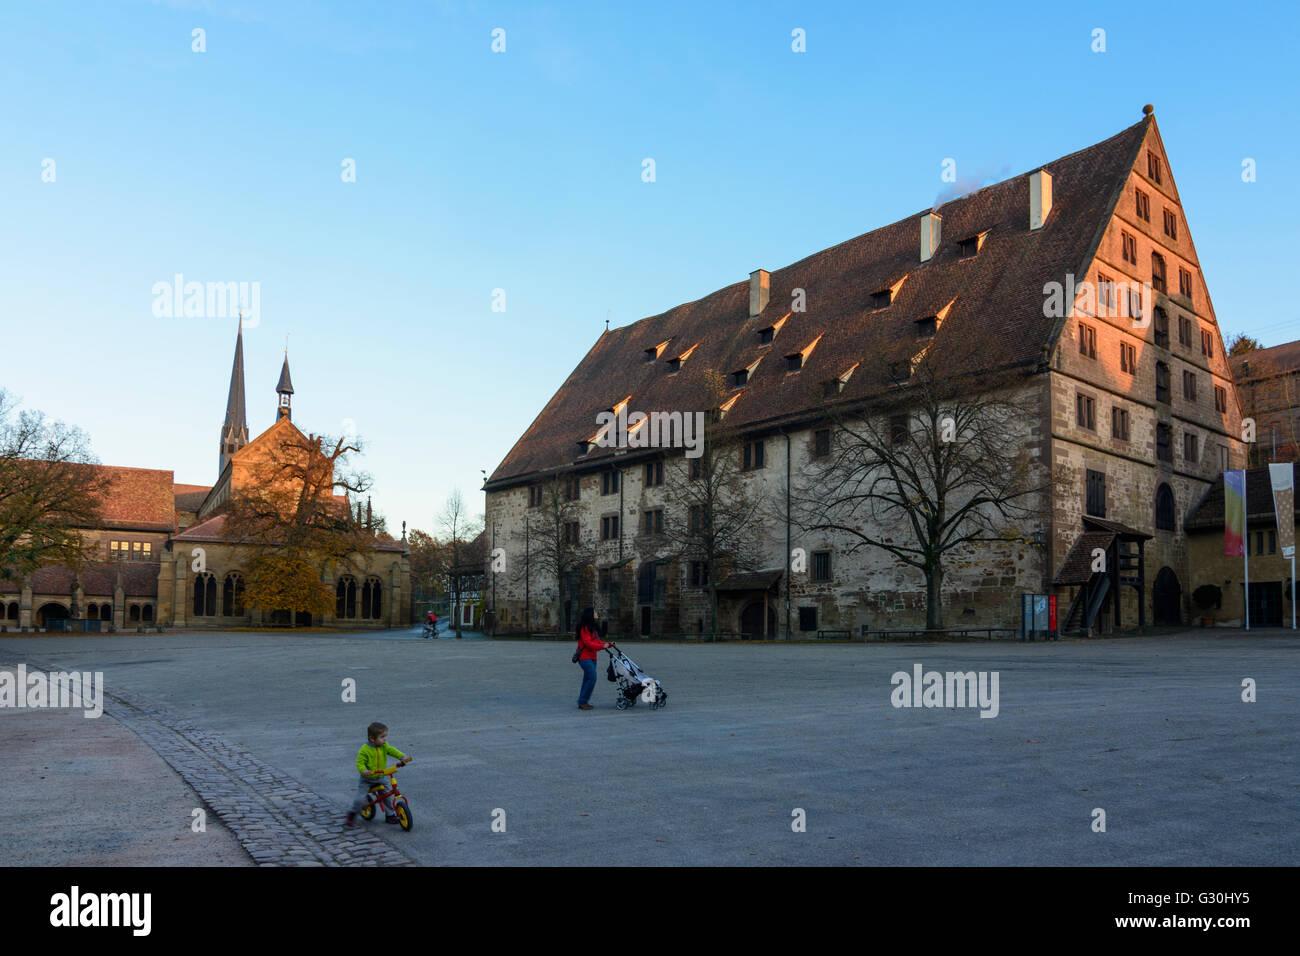 Maulbronn Monastery : monastry church and Fruchtkasten, Germany, Baden-Württemberg, Kraichgau-Stromberg, Maulbronn Stock Photo